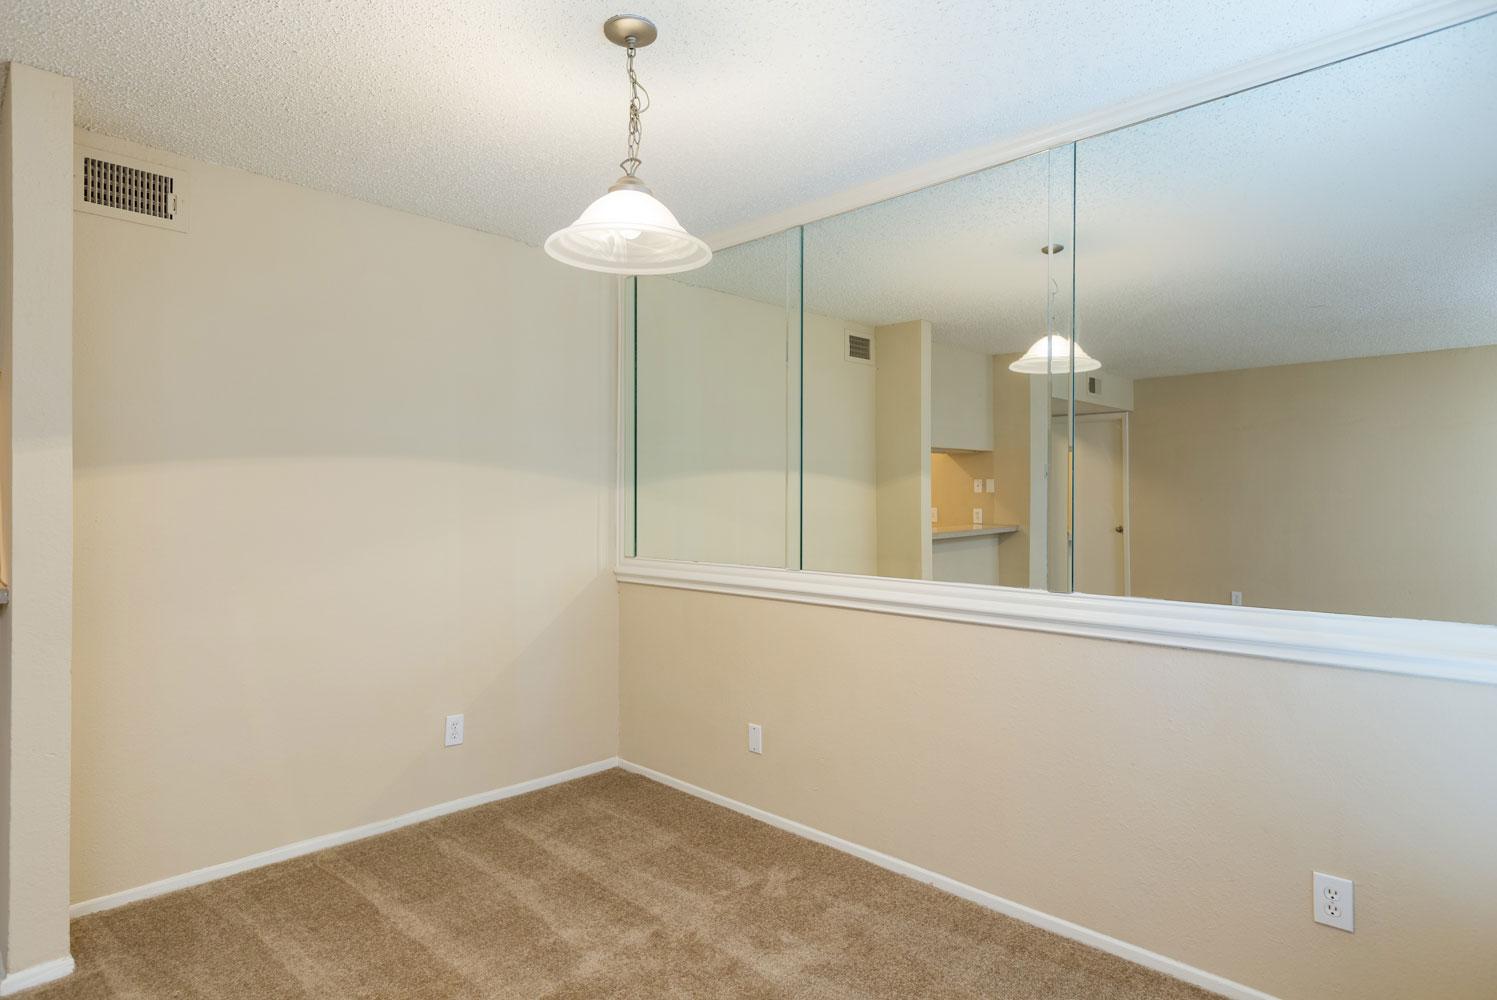 Lighting Fixtures at Sapphire Apartments in San Antonio, Texas